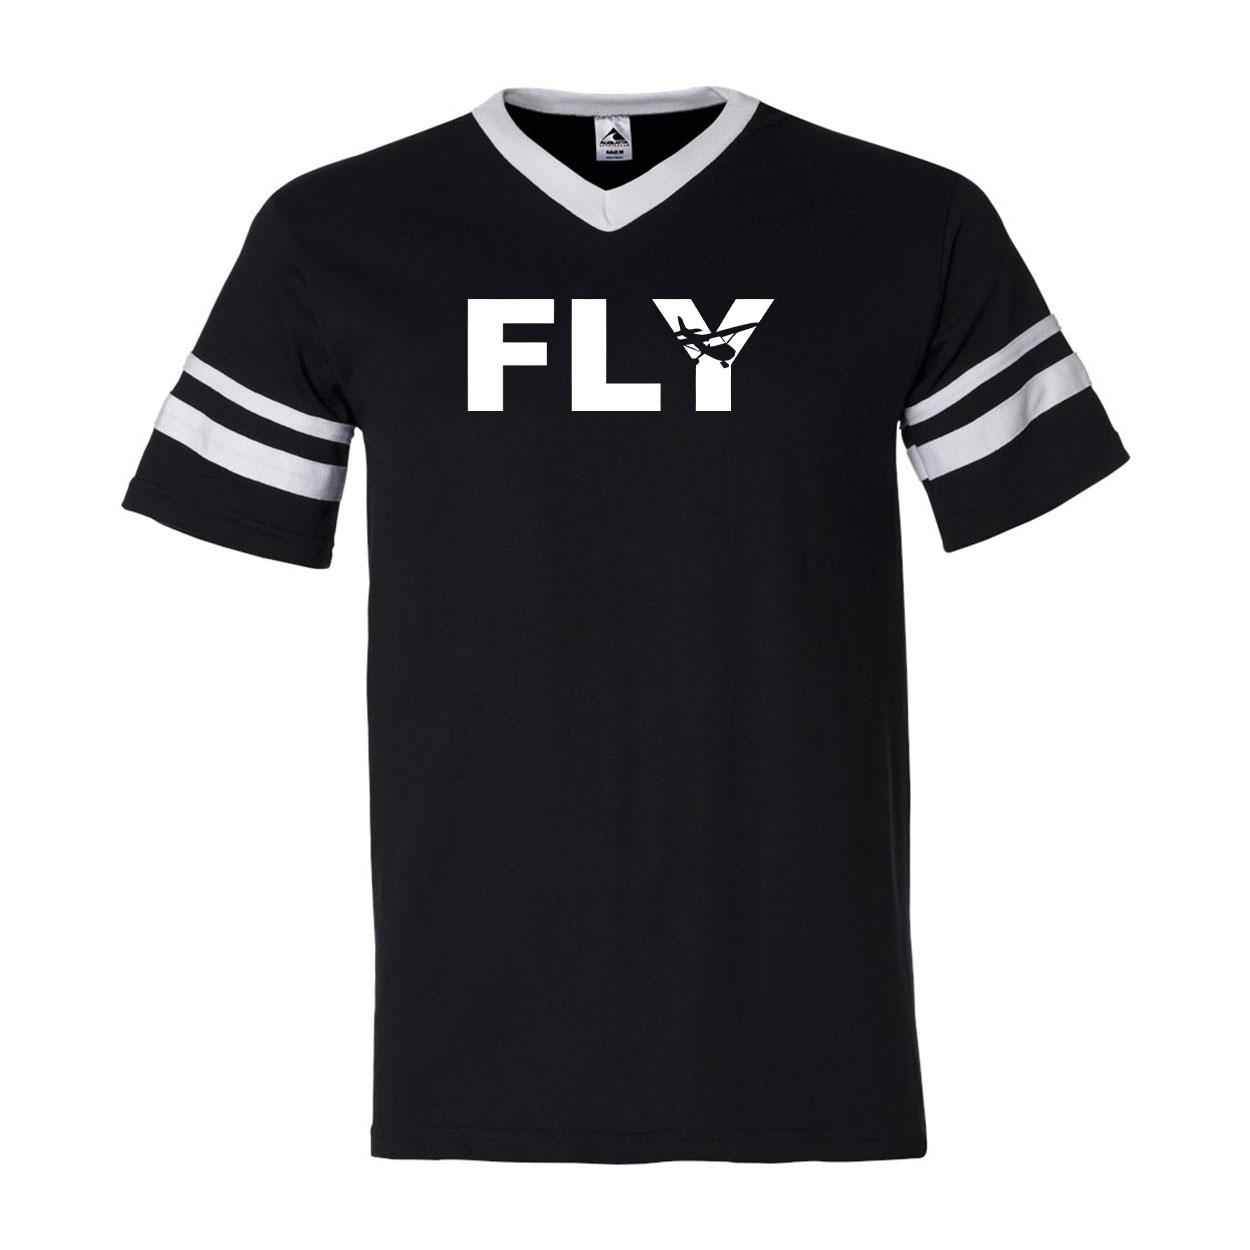 Fly Airplane Logo Classic Premium Striped Jersey T-Shirt Black/White (White Logo)